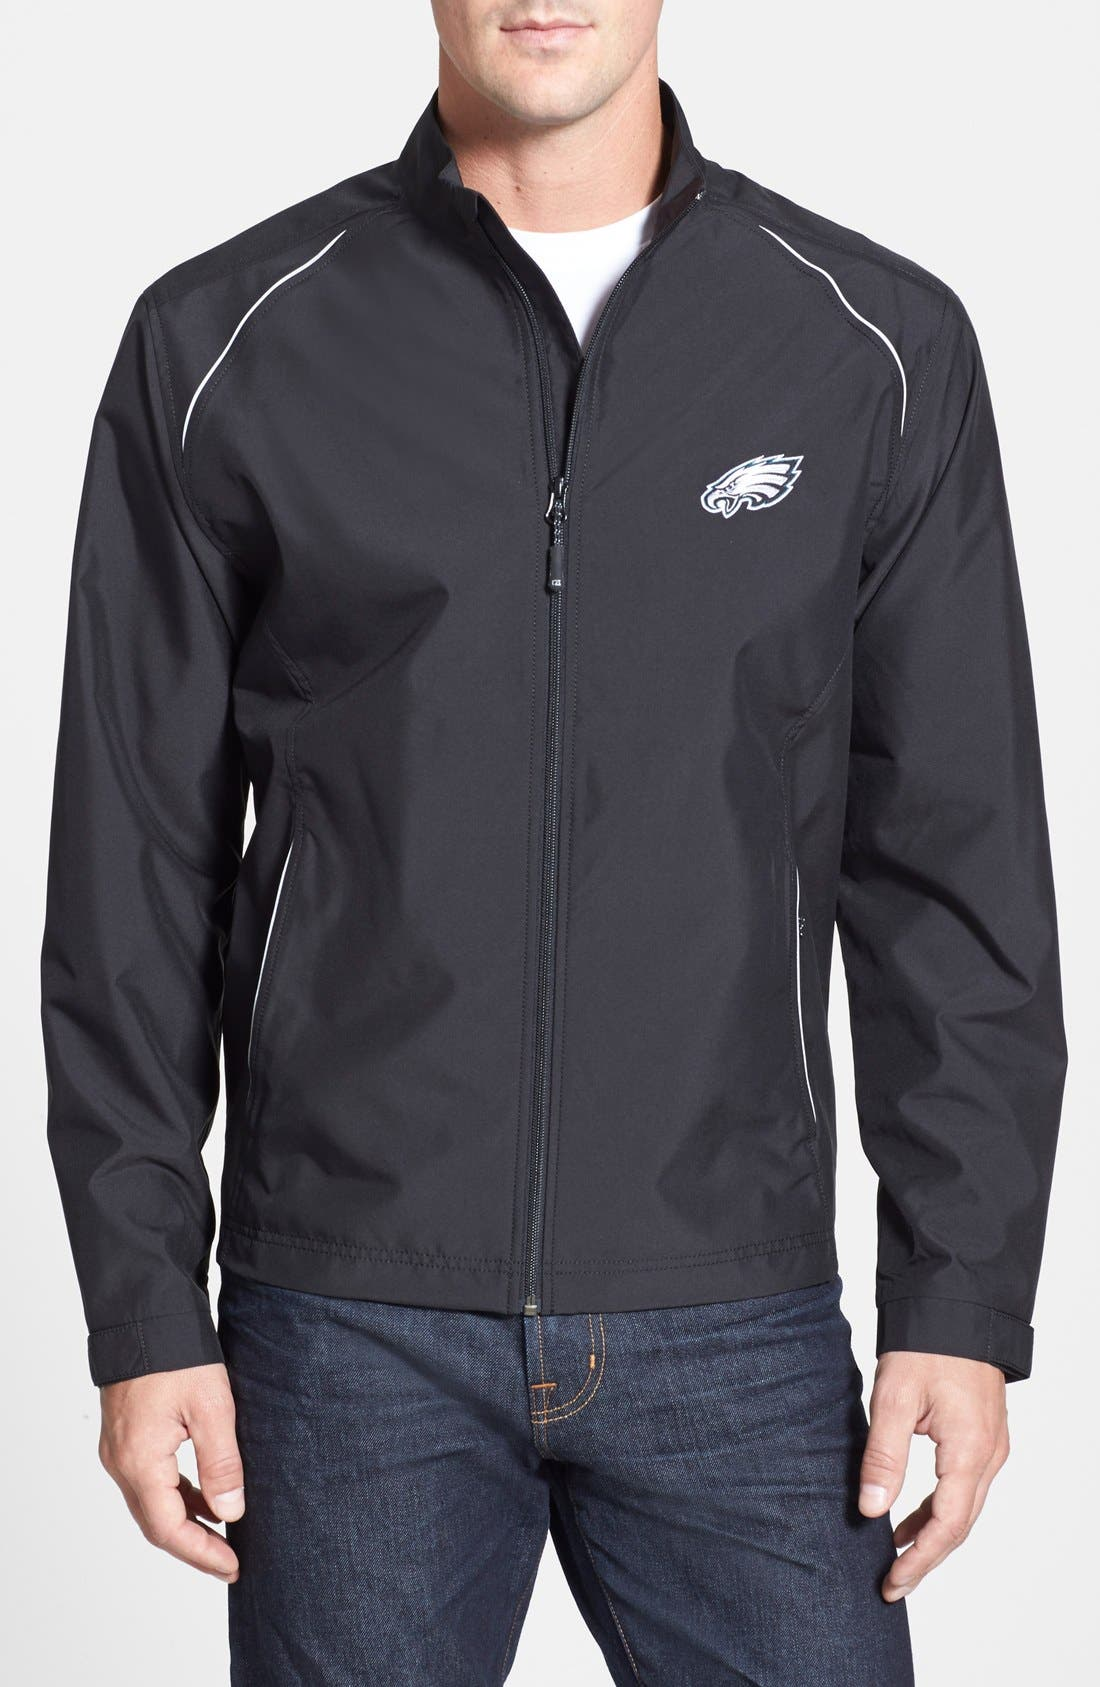 Philadelphia Eagles - Beacon WeatherTec Wind & Water Resistant Jacket,                             Main thumbnail 1, color,                             Black